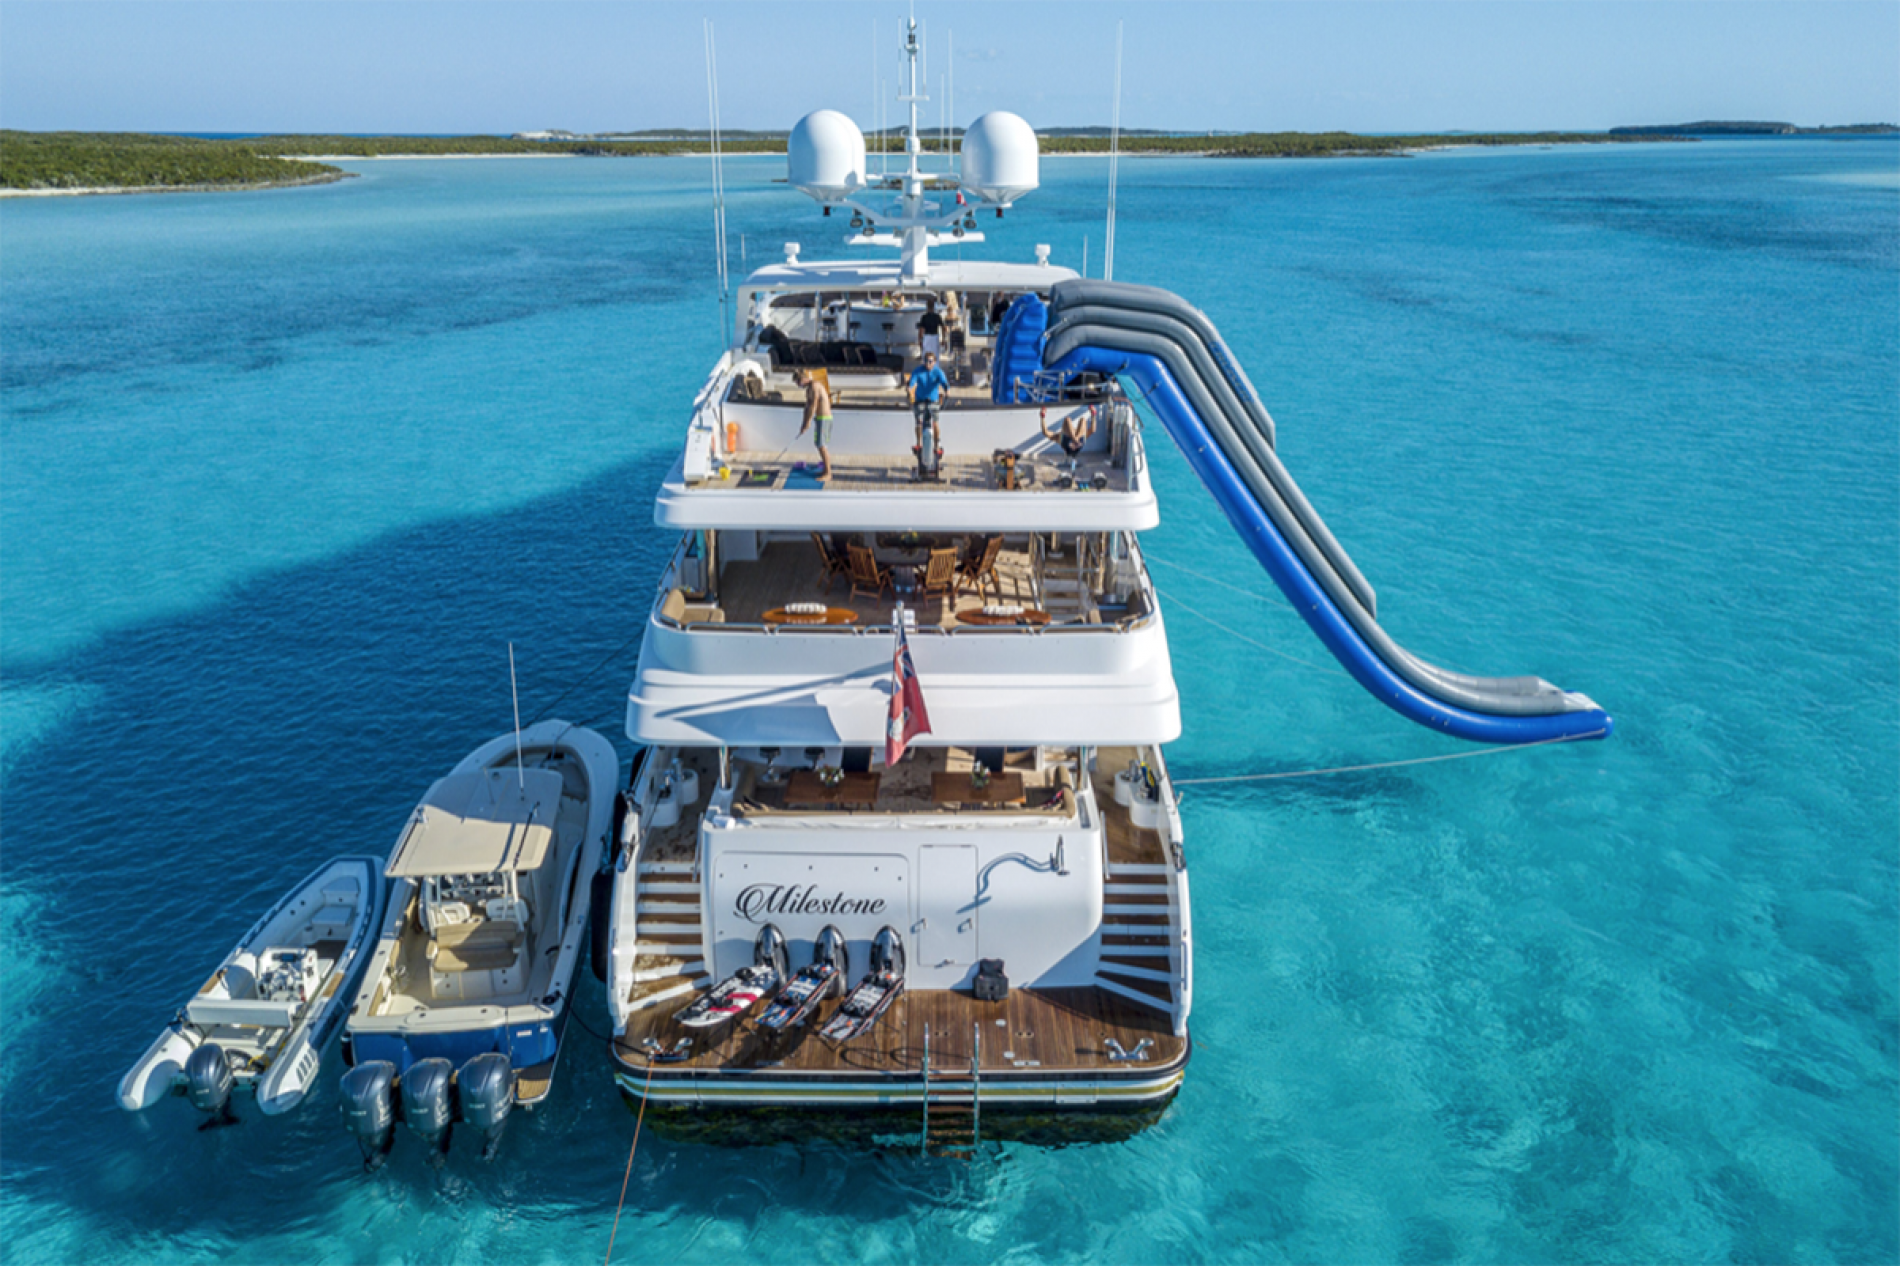 MILESTONE - Luxury Motor Yacht For Charter - Exterior Design - Img 1   C&N